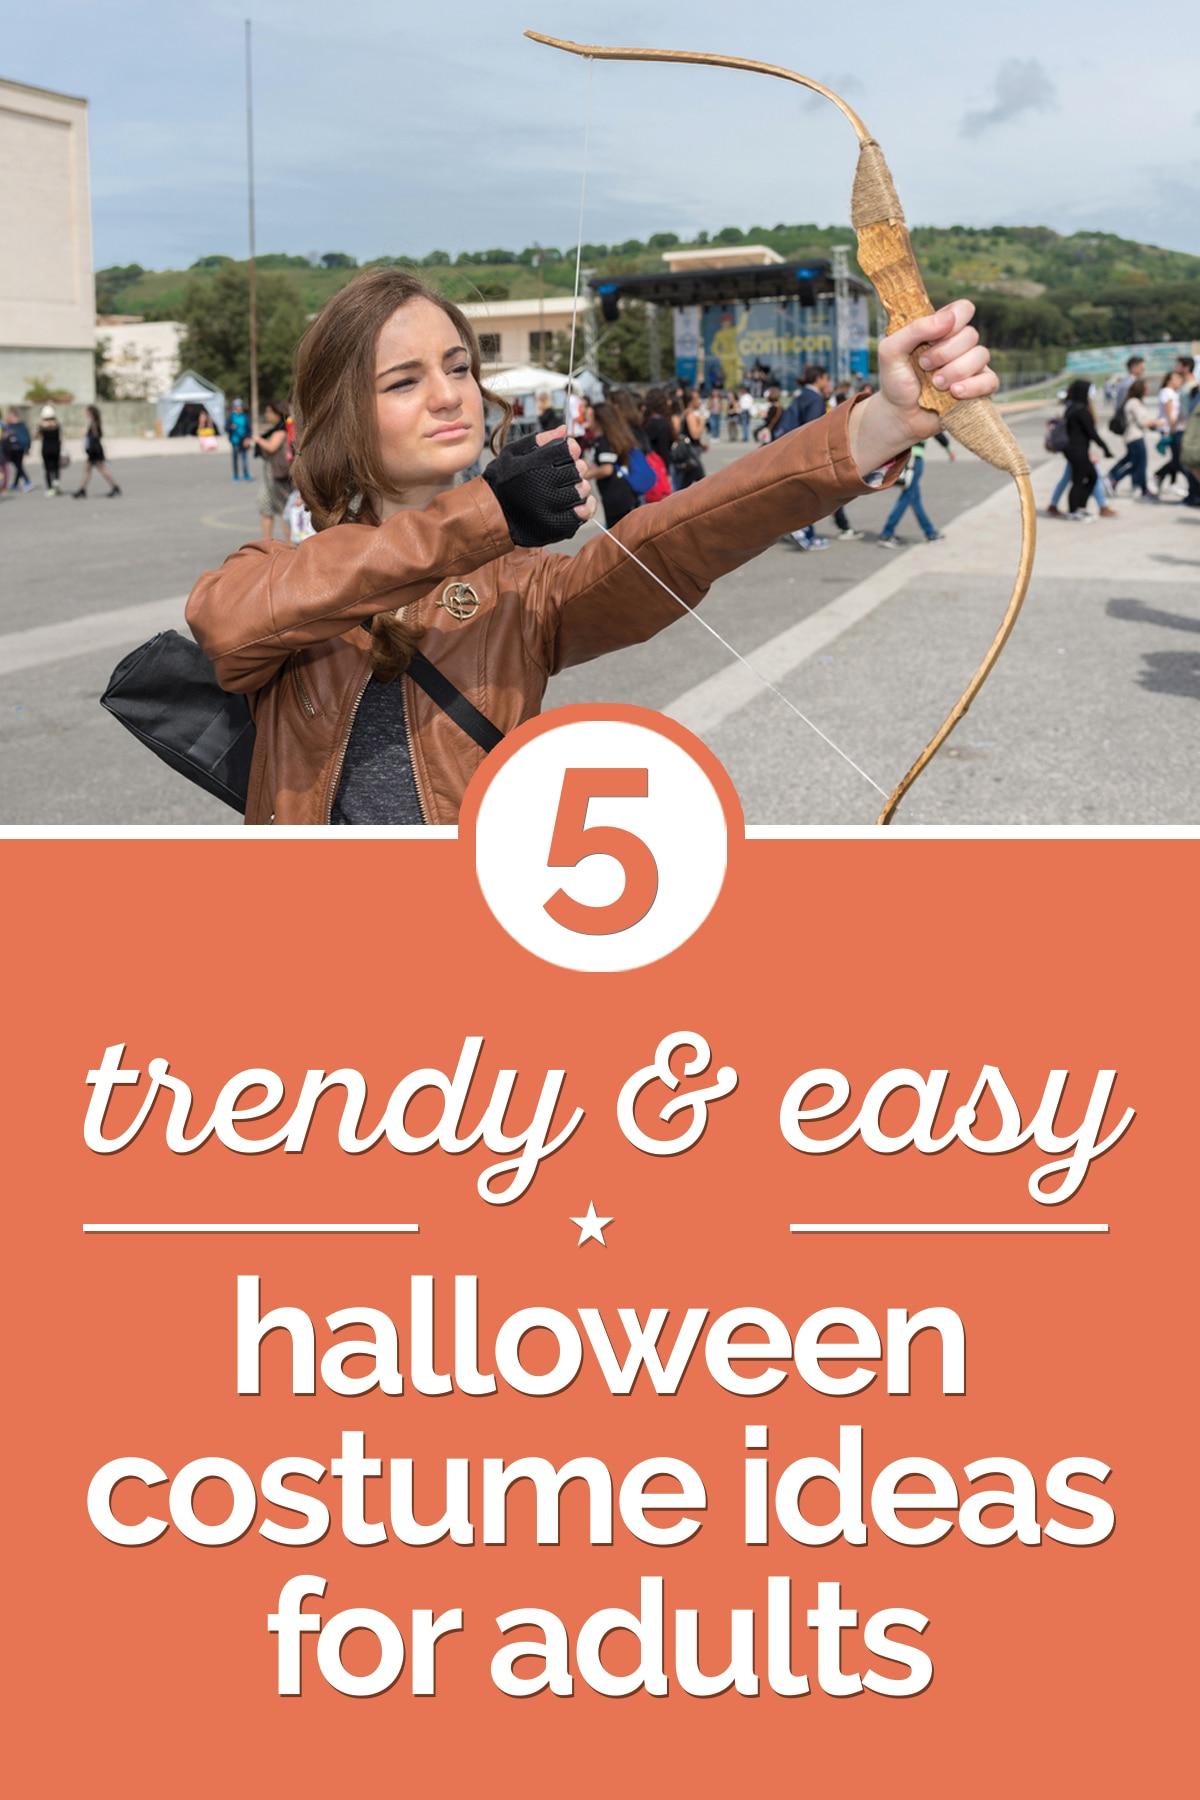 5 Trendy & Easy Halloween Costume Ideas for Adults - thegoodstuff